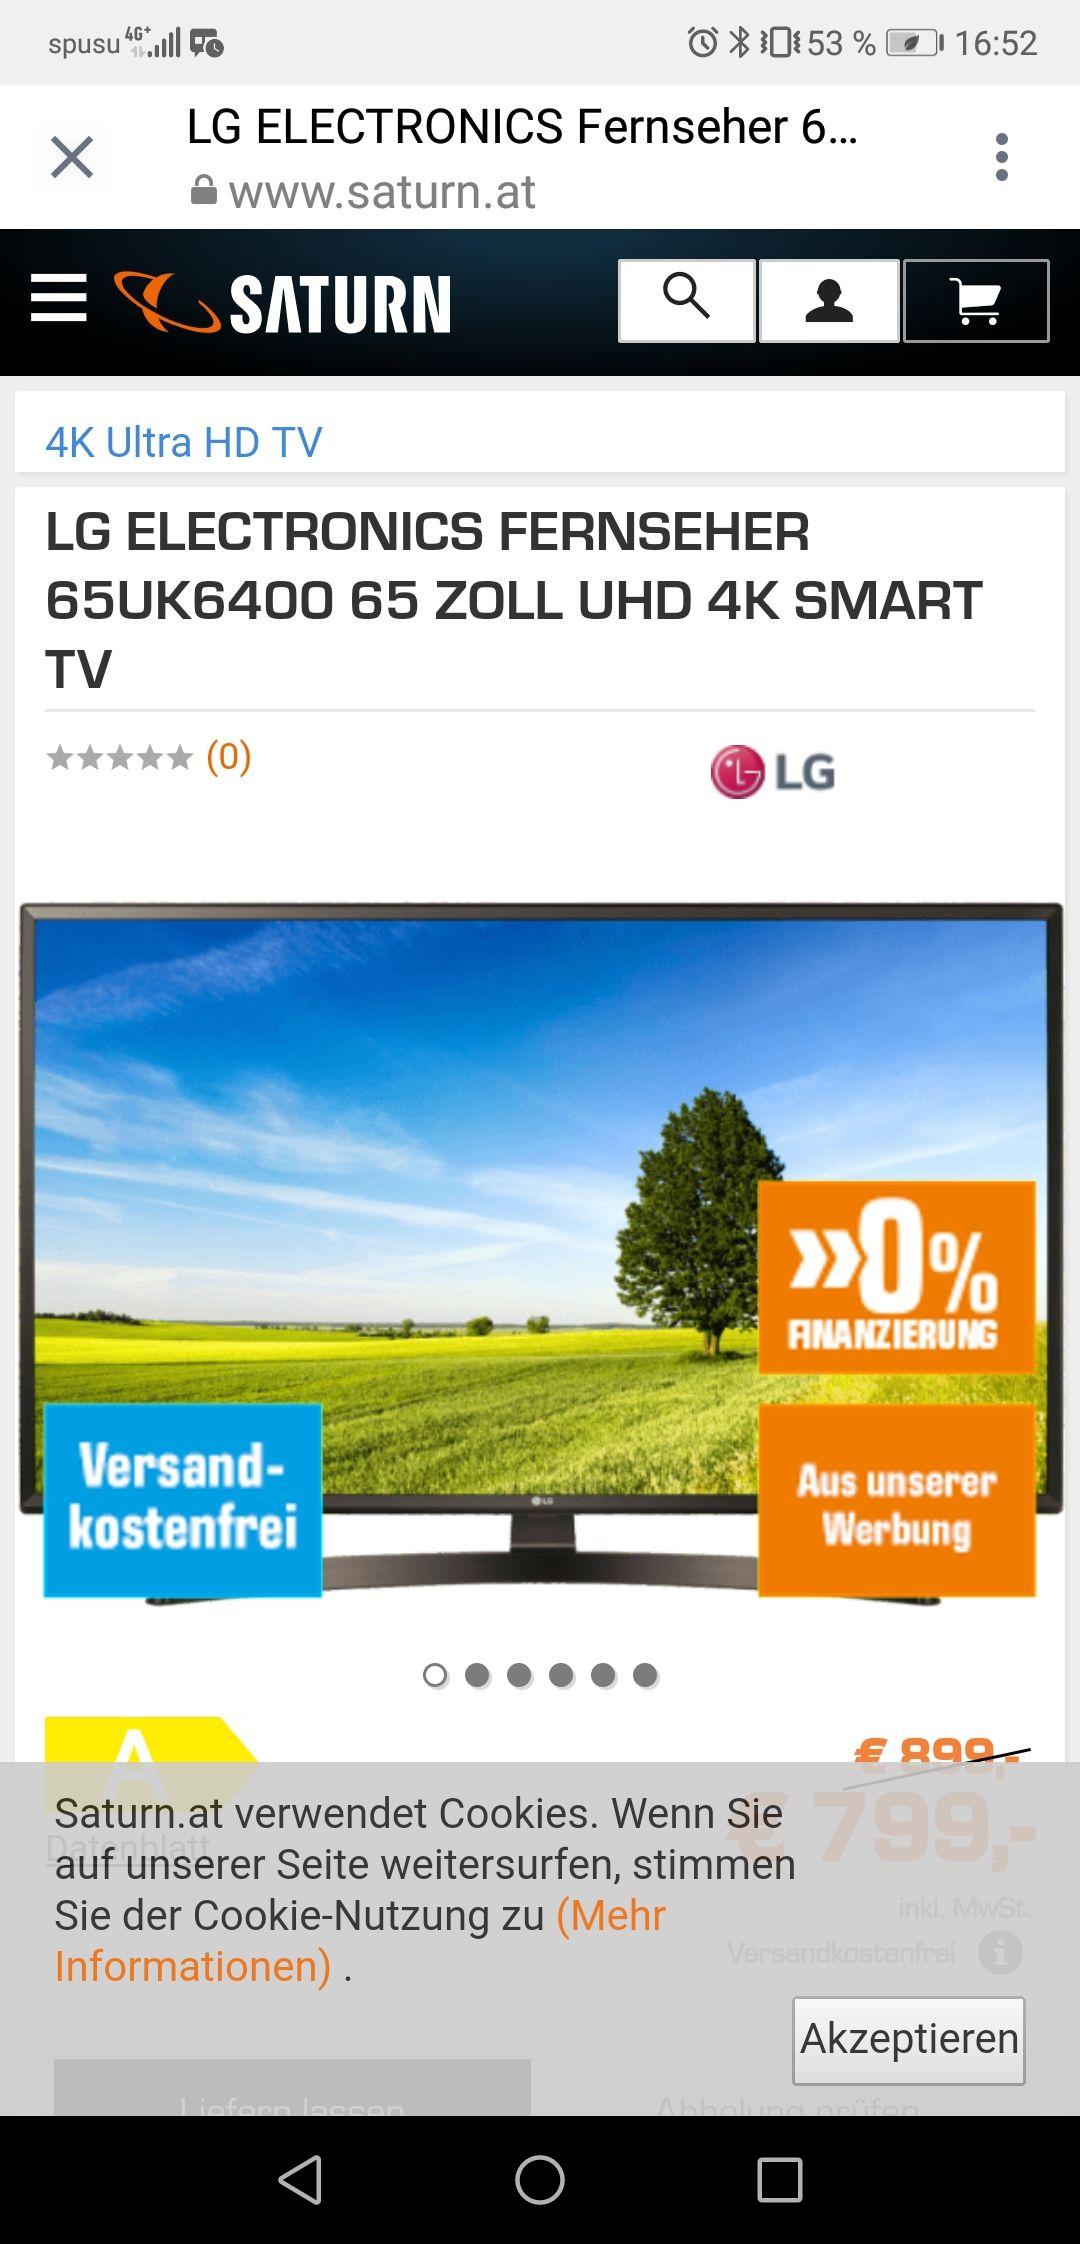 LG ELECTRONICS FERNSEHER 65UK6400 65 ZOLL UHD 4K SMART TV